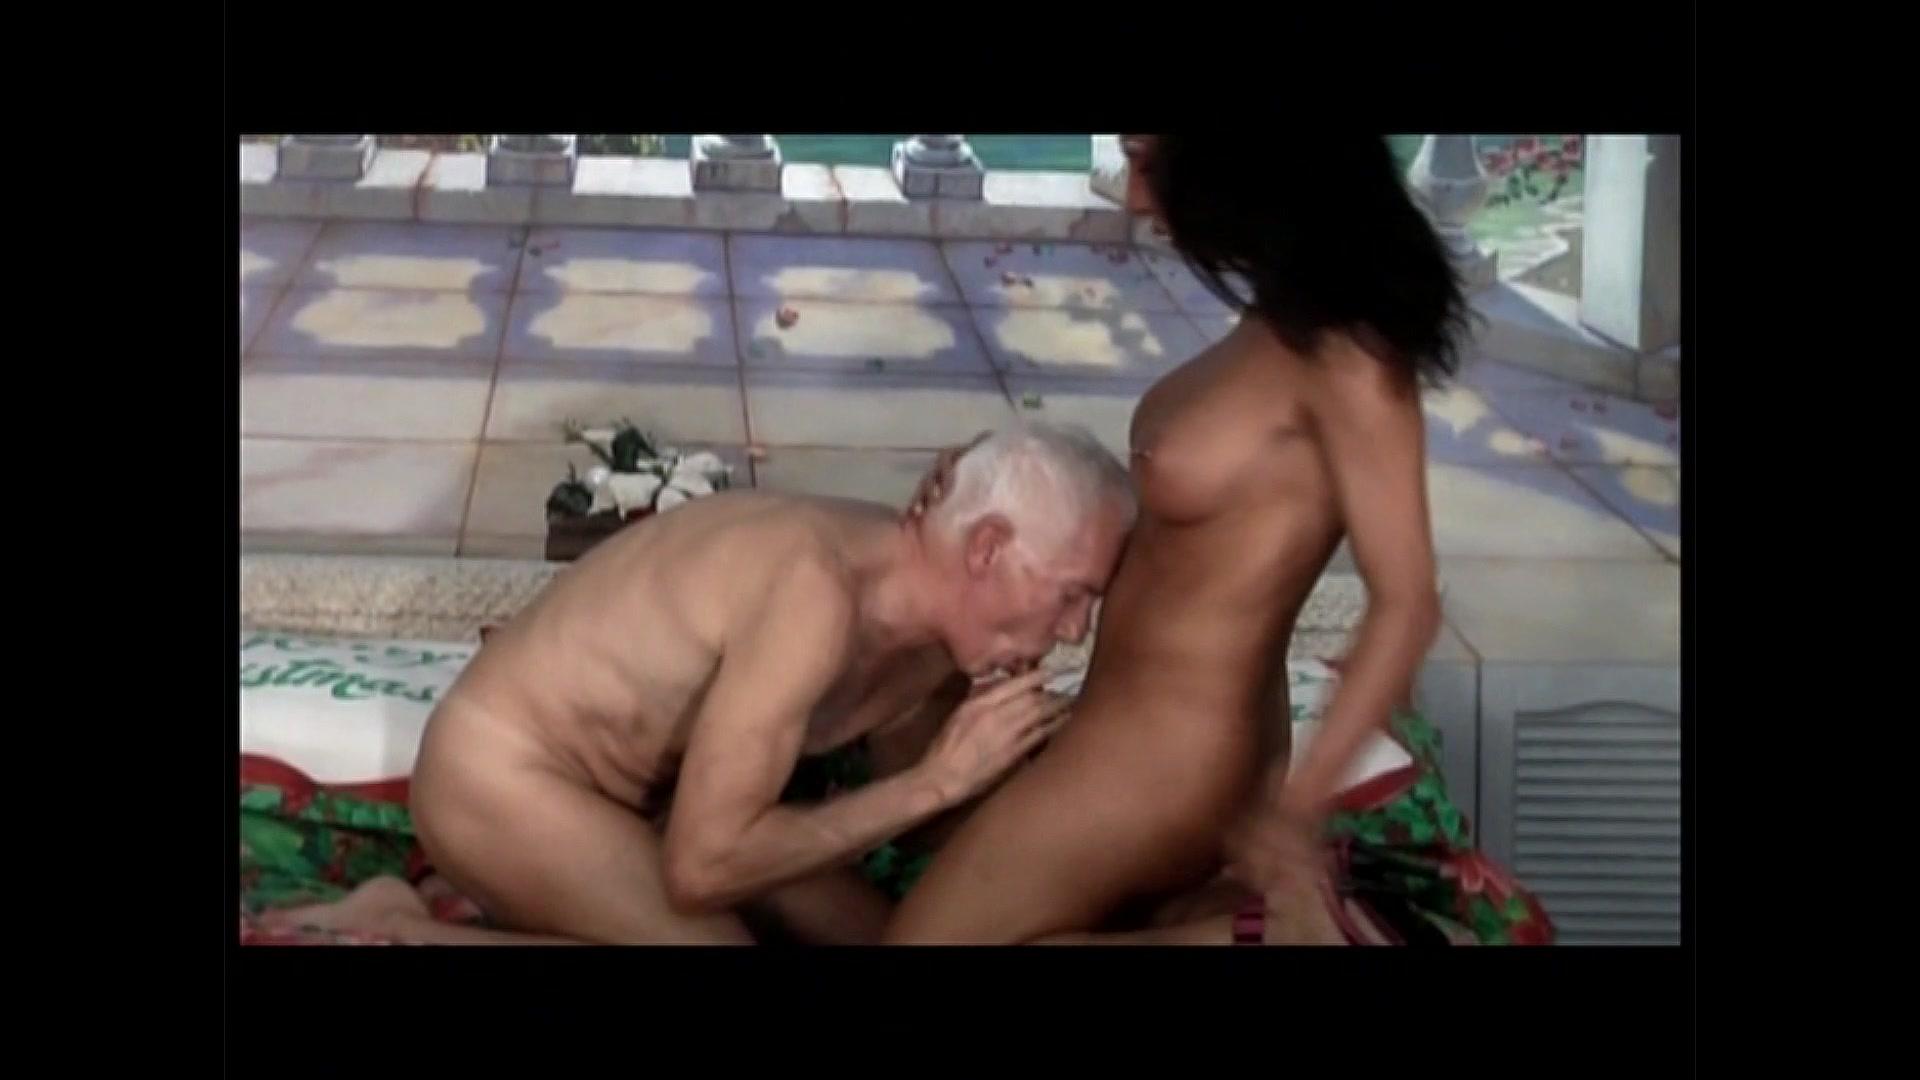 transsexual adult video jpg 1500x1000